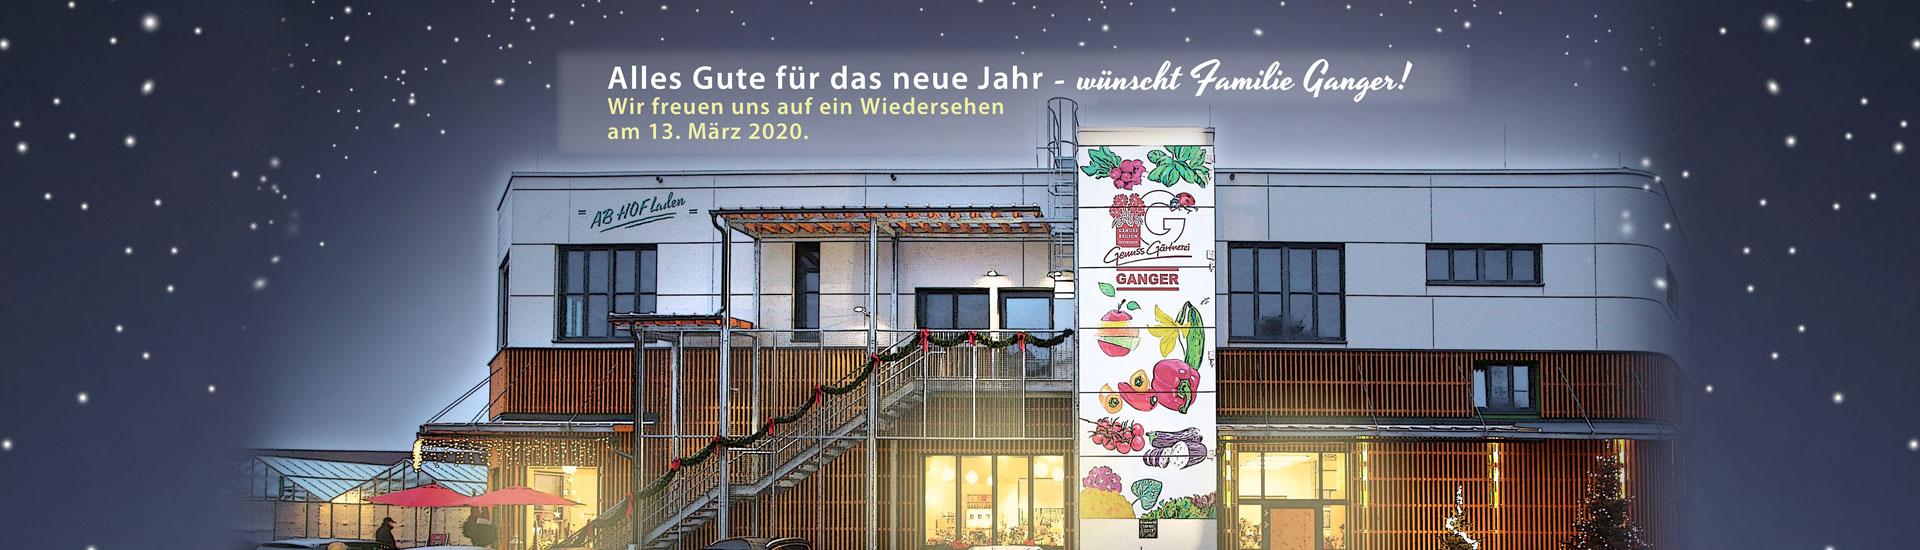 Gärtnerei Ganger | Weihnachtsgruss 2019